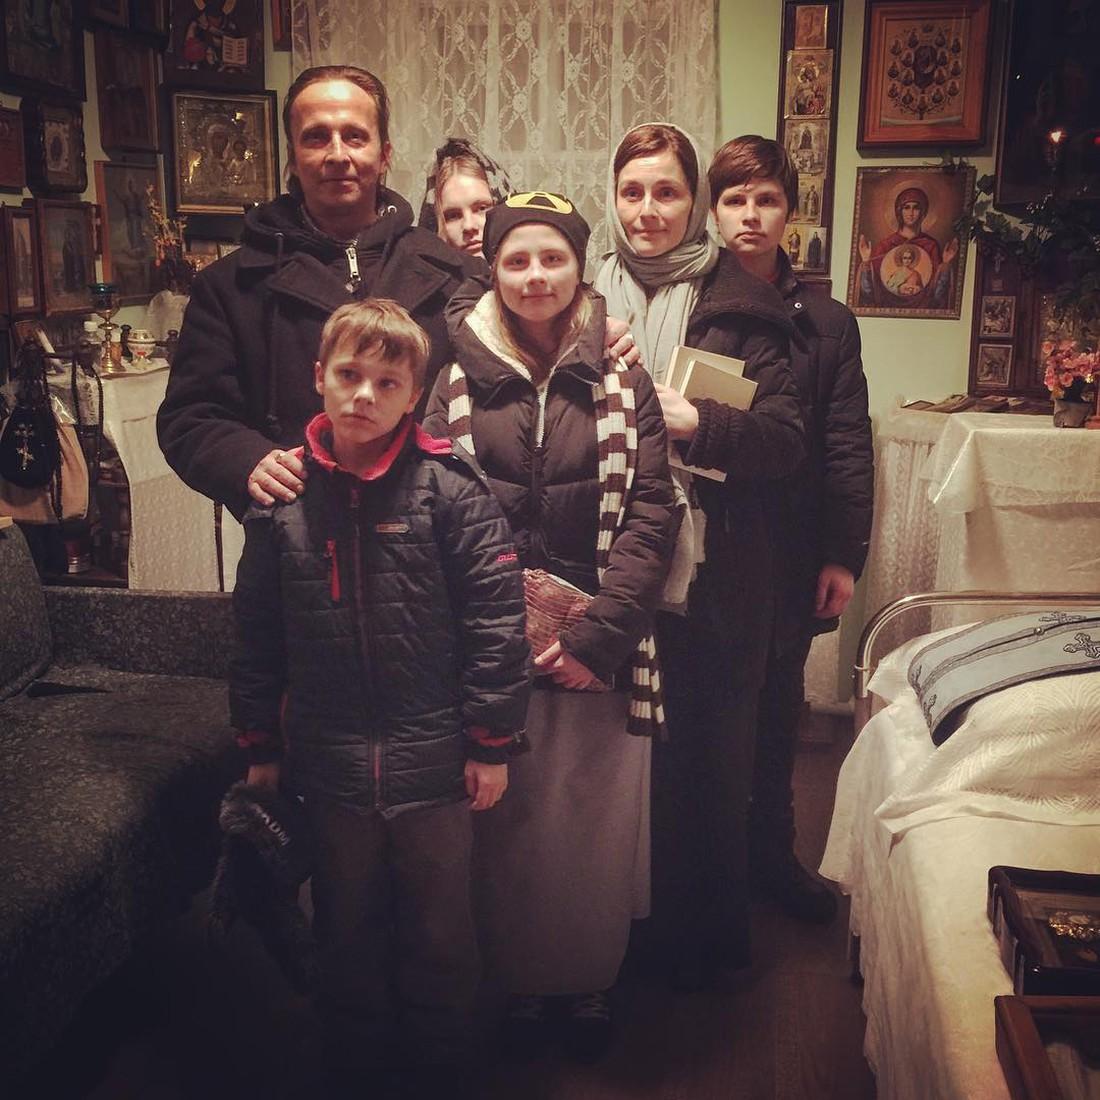 https://obaldela.ru/wp-content/uploads/2018/03/g_51beefced182d36972e2ca8aa9309cd8_2_1400x1100.jpg